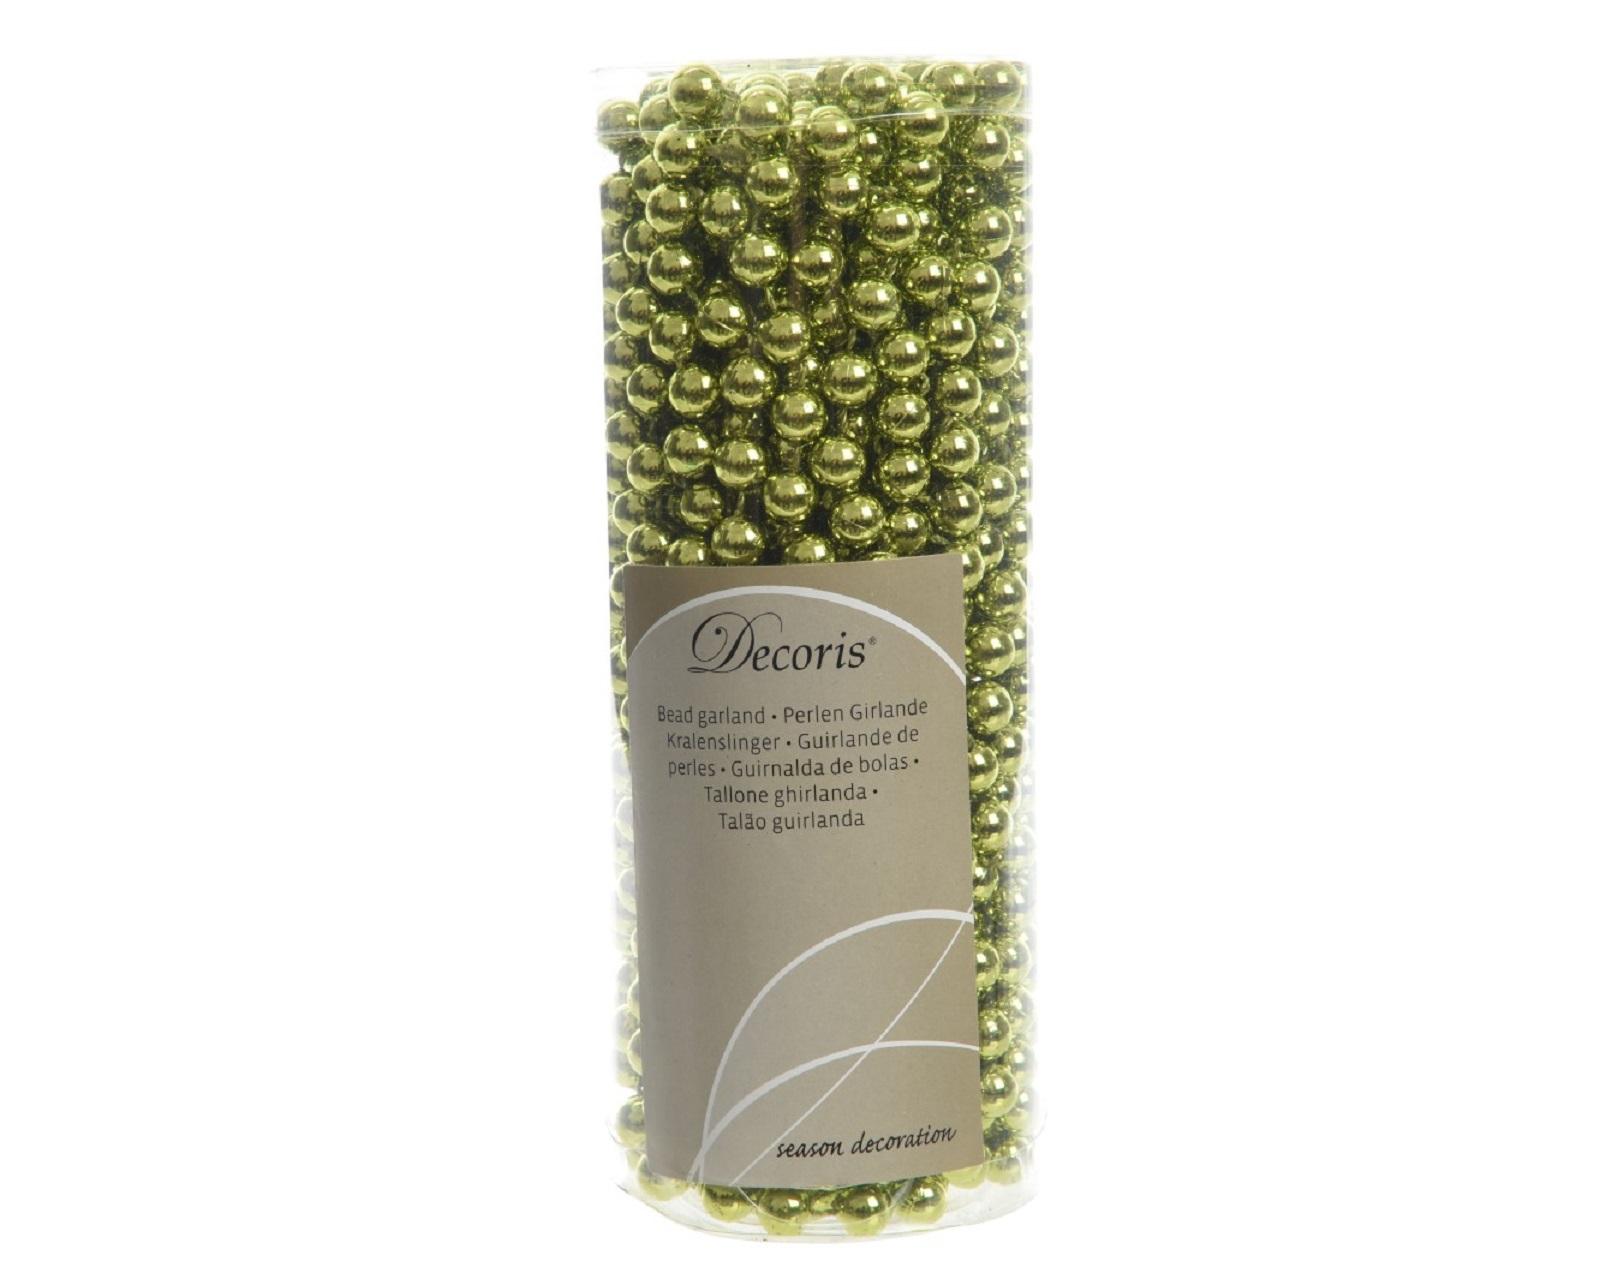 Perlenkette  Kunststoff Kette Perlengirlande Baumschmuck  10 m olivfarbig